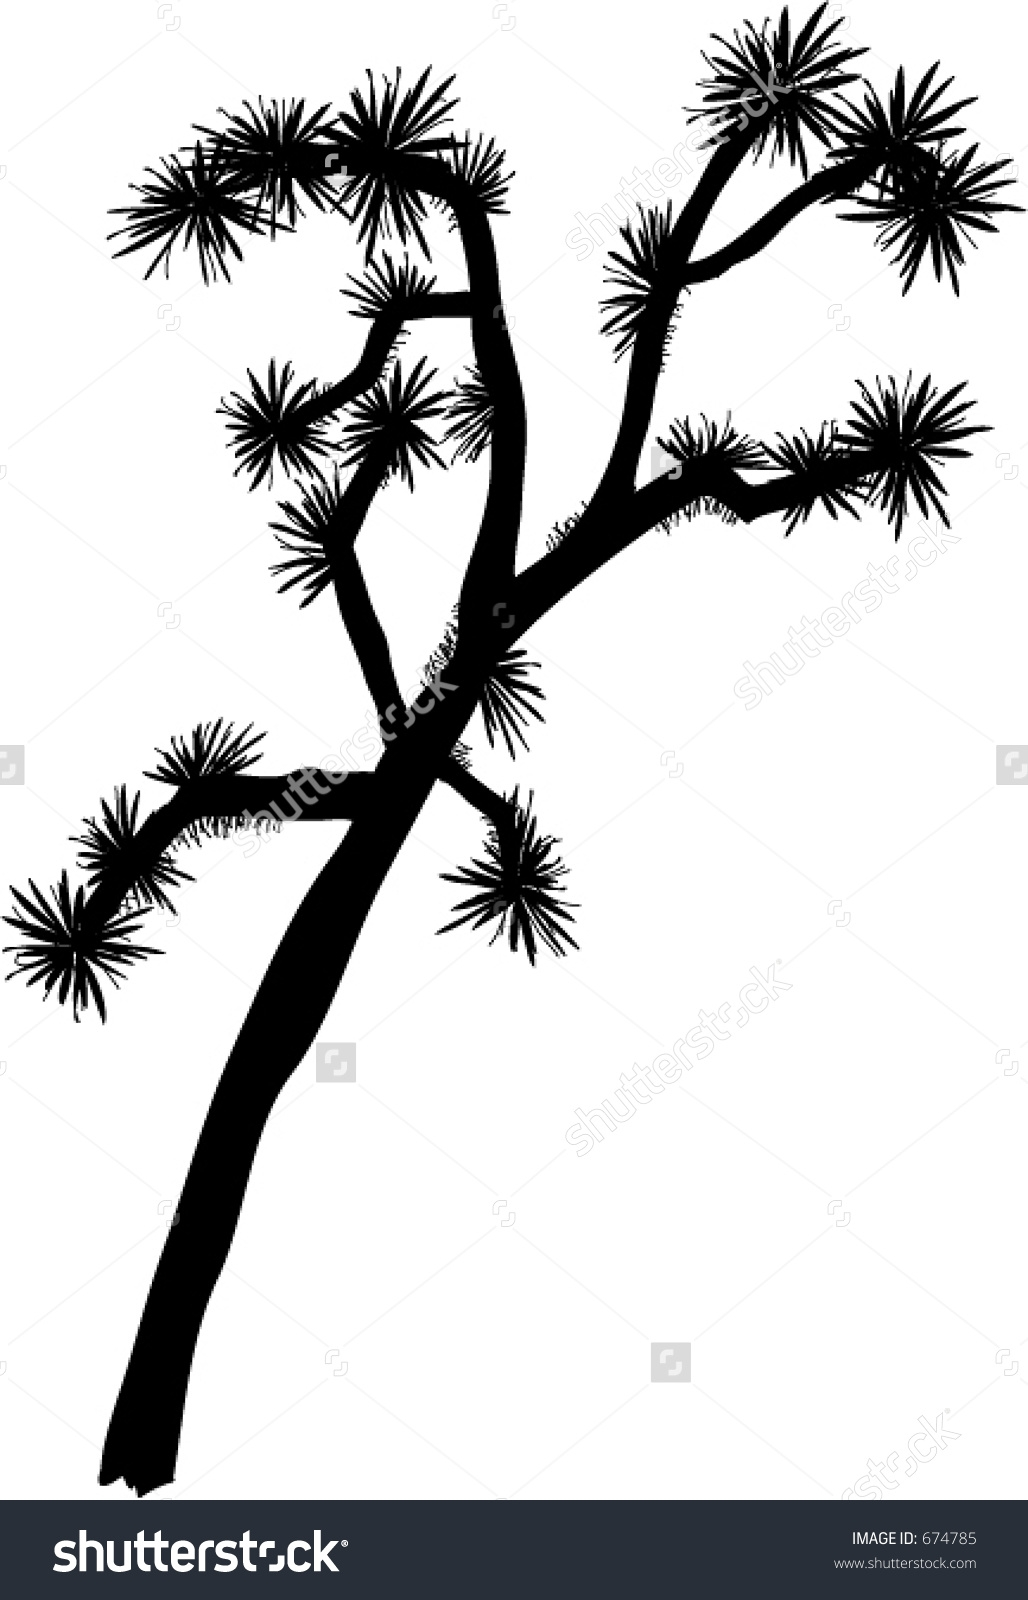 Joshua Tree clipart #4, Download drawings